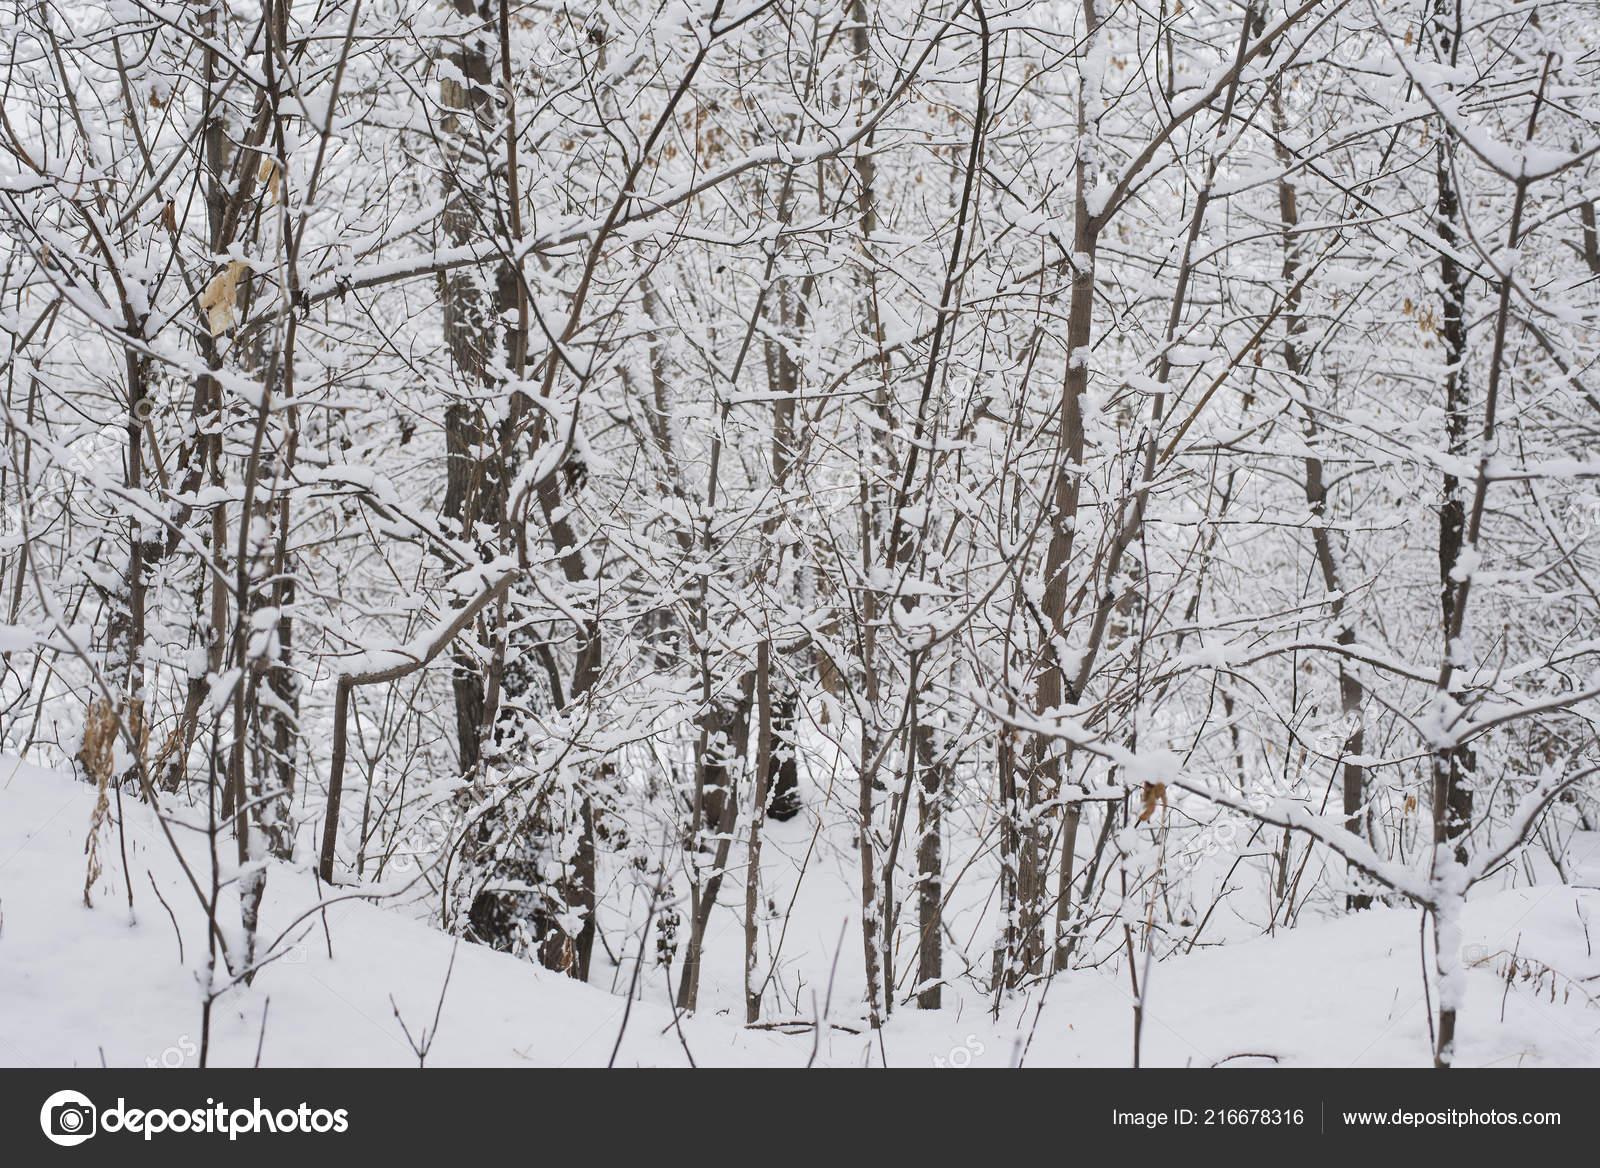 depositphotos 216678316 stock photo winter landscape park garden snow